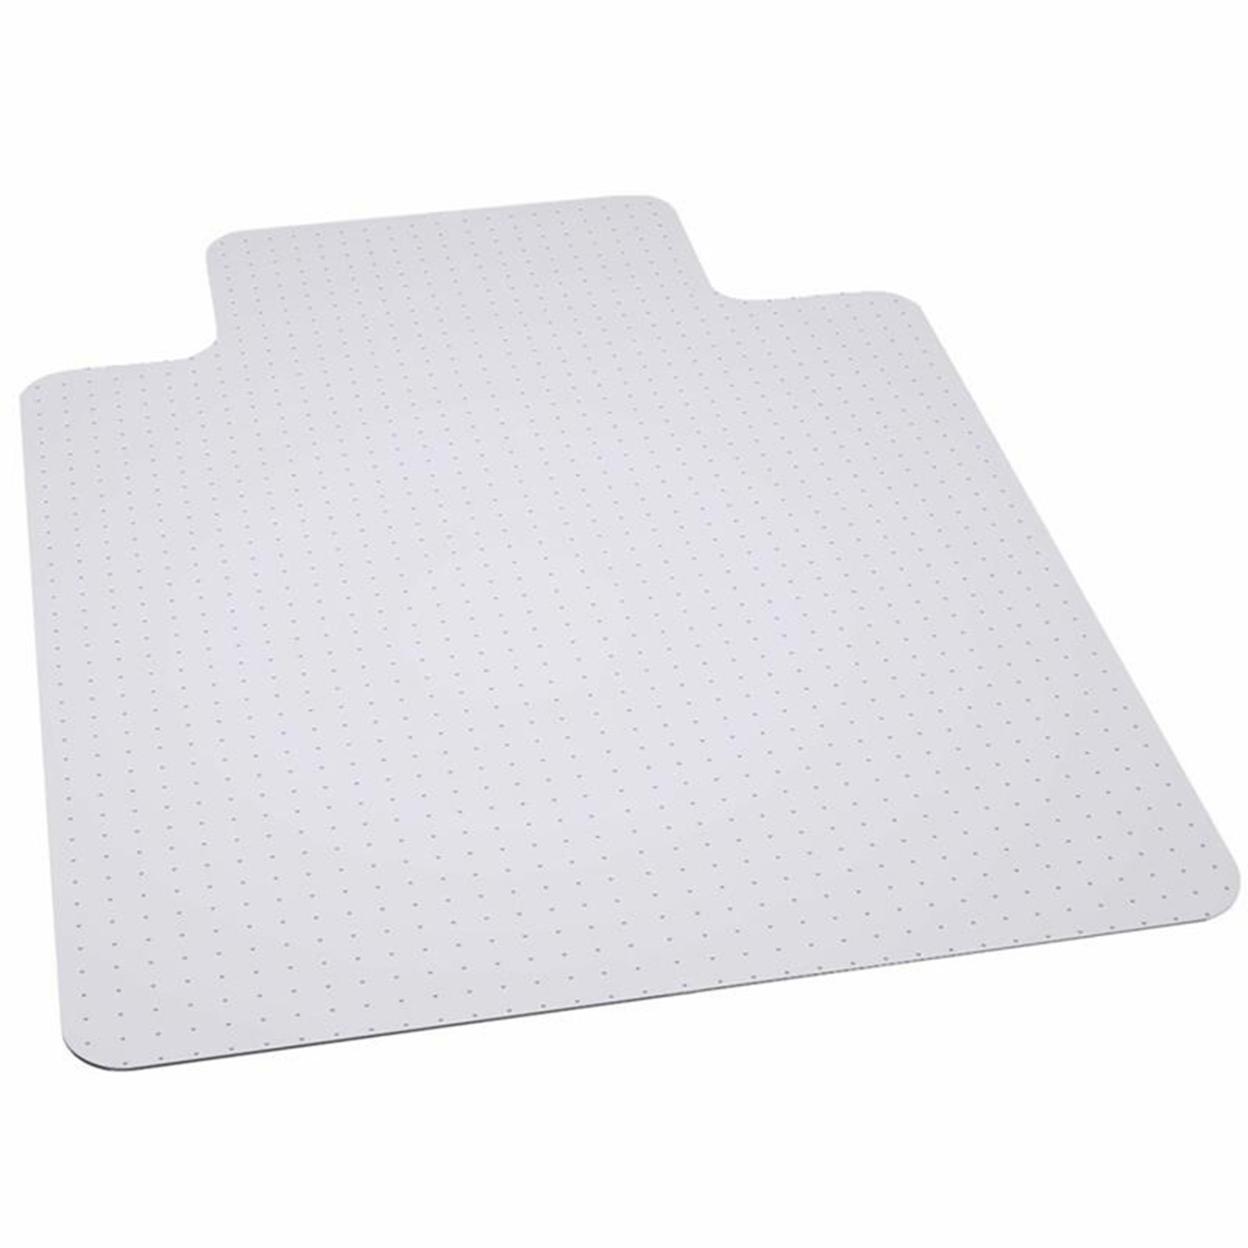 Flash Furniture 36′ x 48′ Big & Tall 400 lb. Capacity Carpet Chairmat with Lip [Mat-124086-Gg]